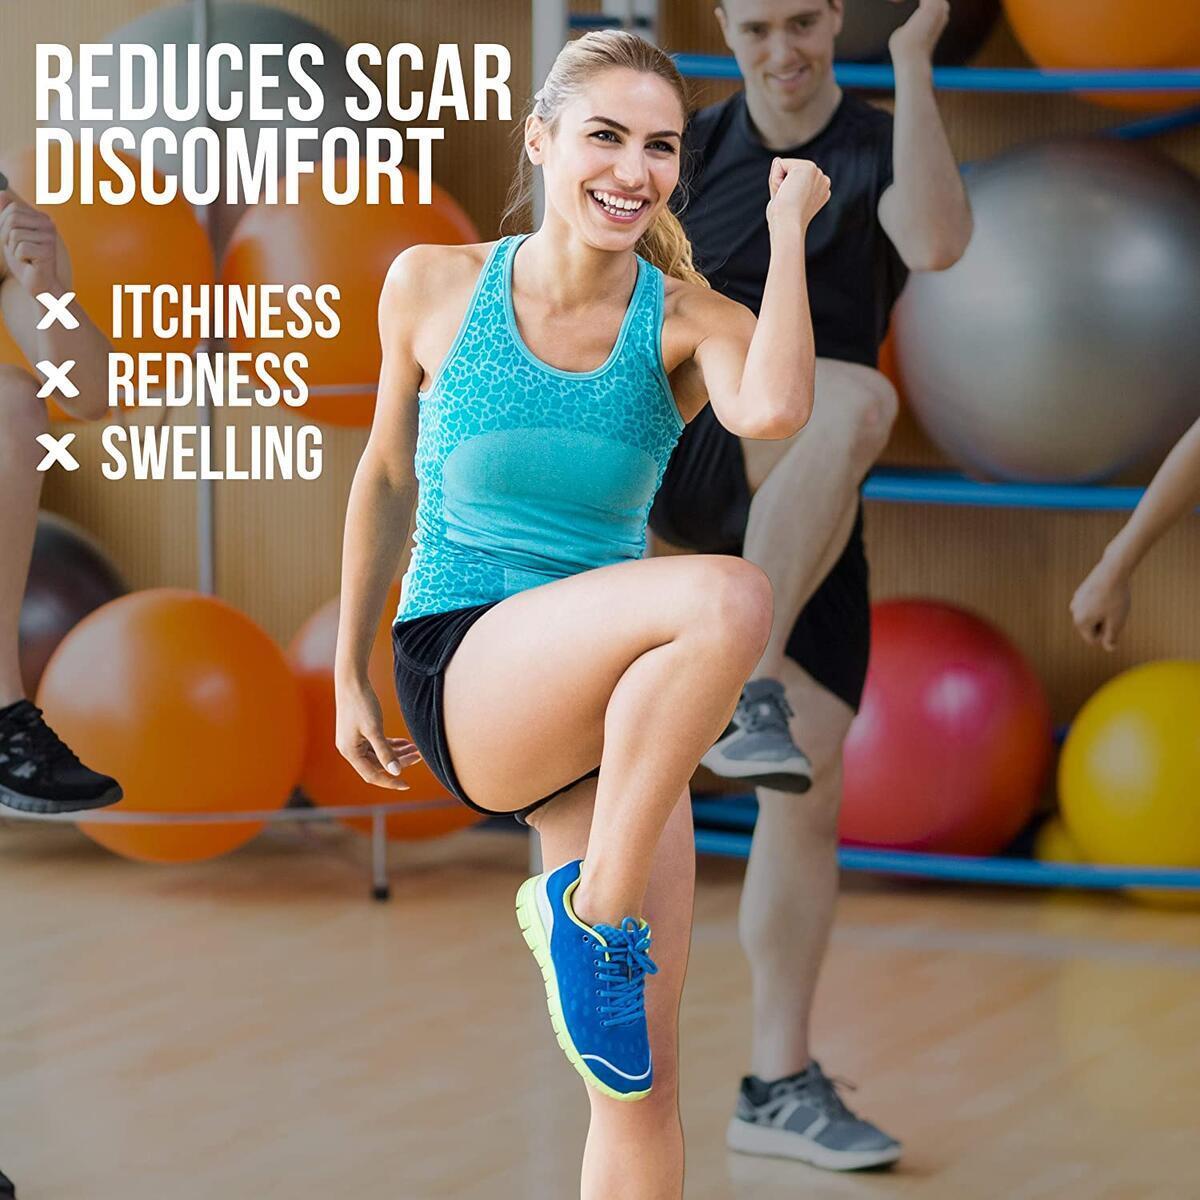 [Advanced] Silicone Scar Gel 40g, Scar Removal Gel, Silicone Gel Scar Treatment For Old & New Scars, Keloid, Acne Scar Gel, Scar Remover Gel for Surgery Scars, C Section, Stretch Marks Scar Repair Gel